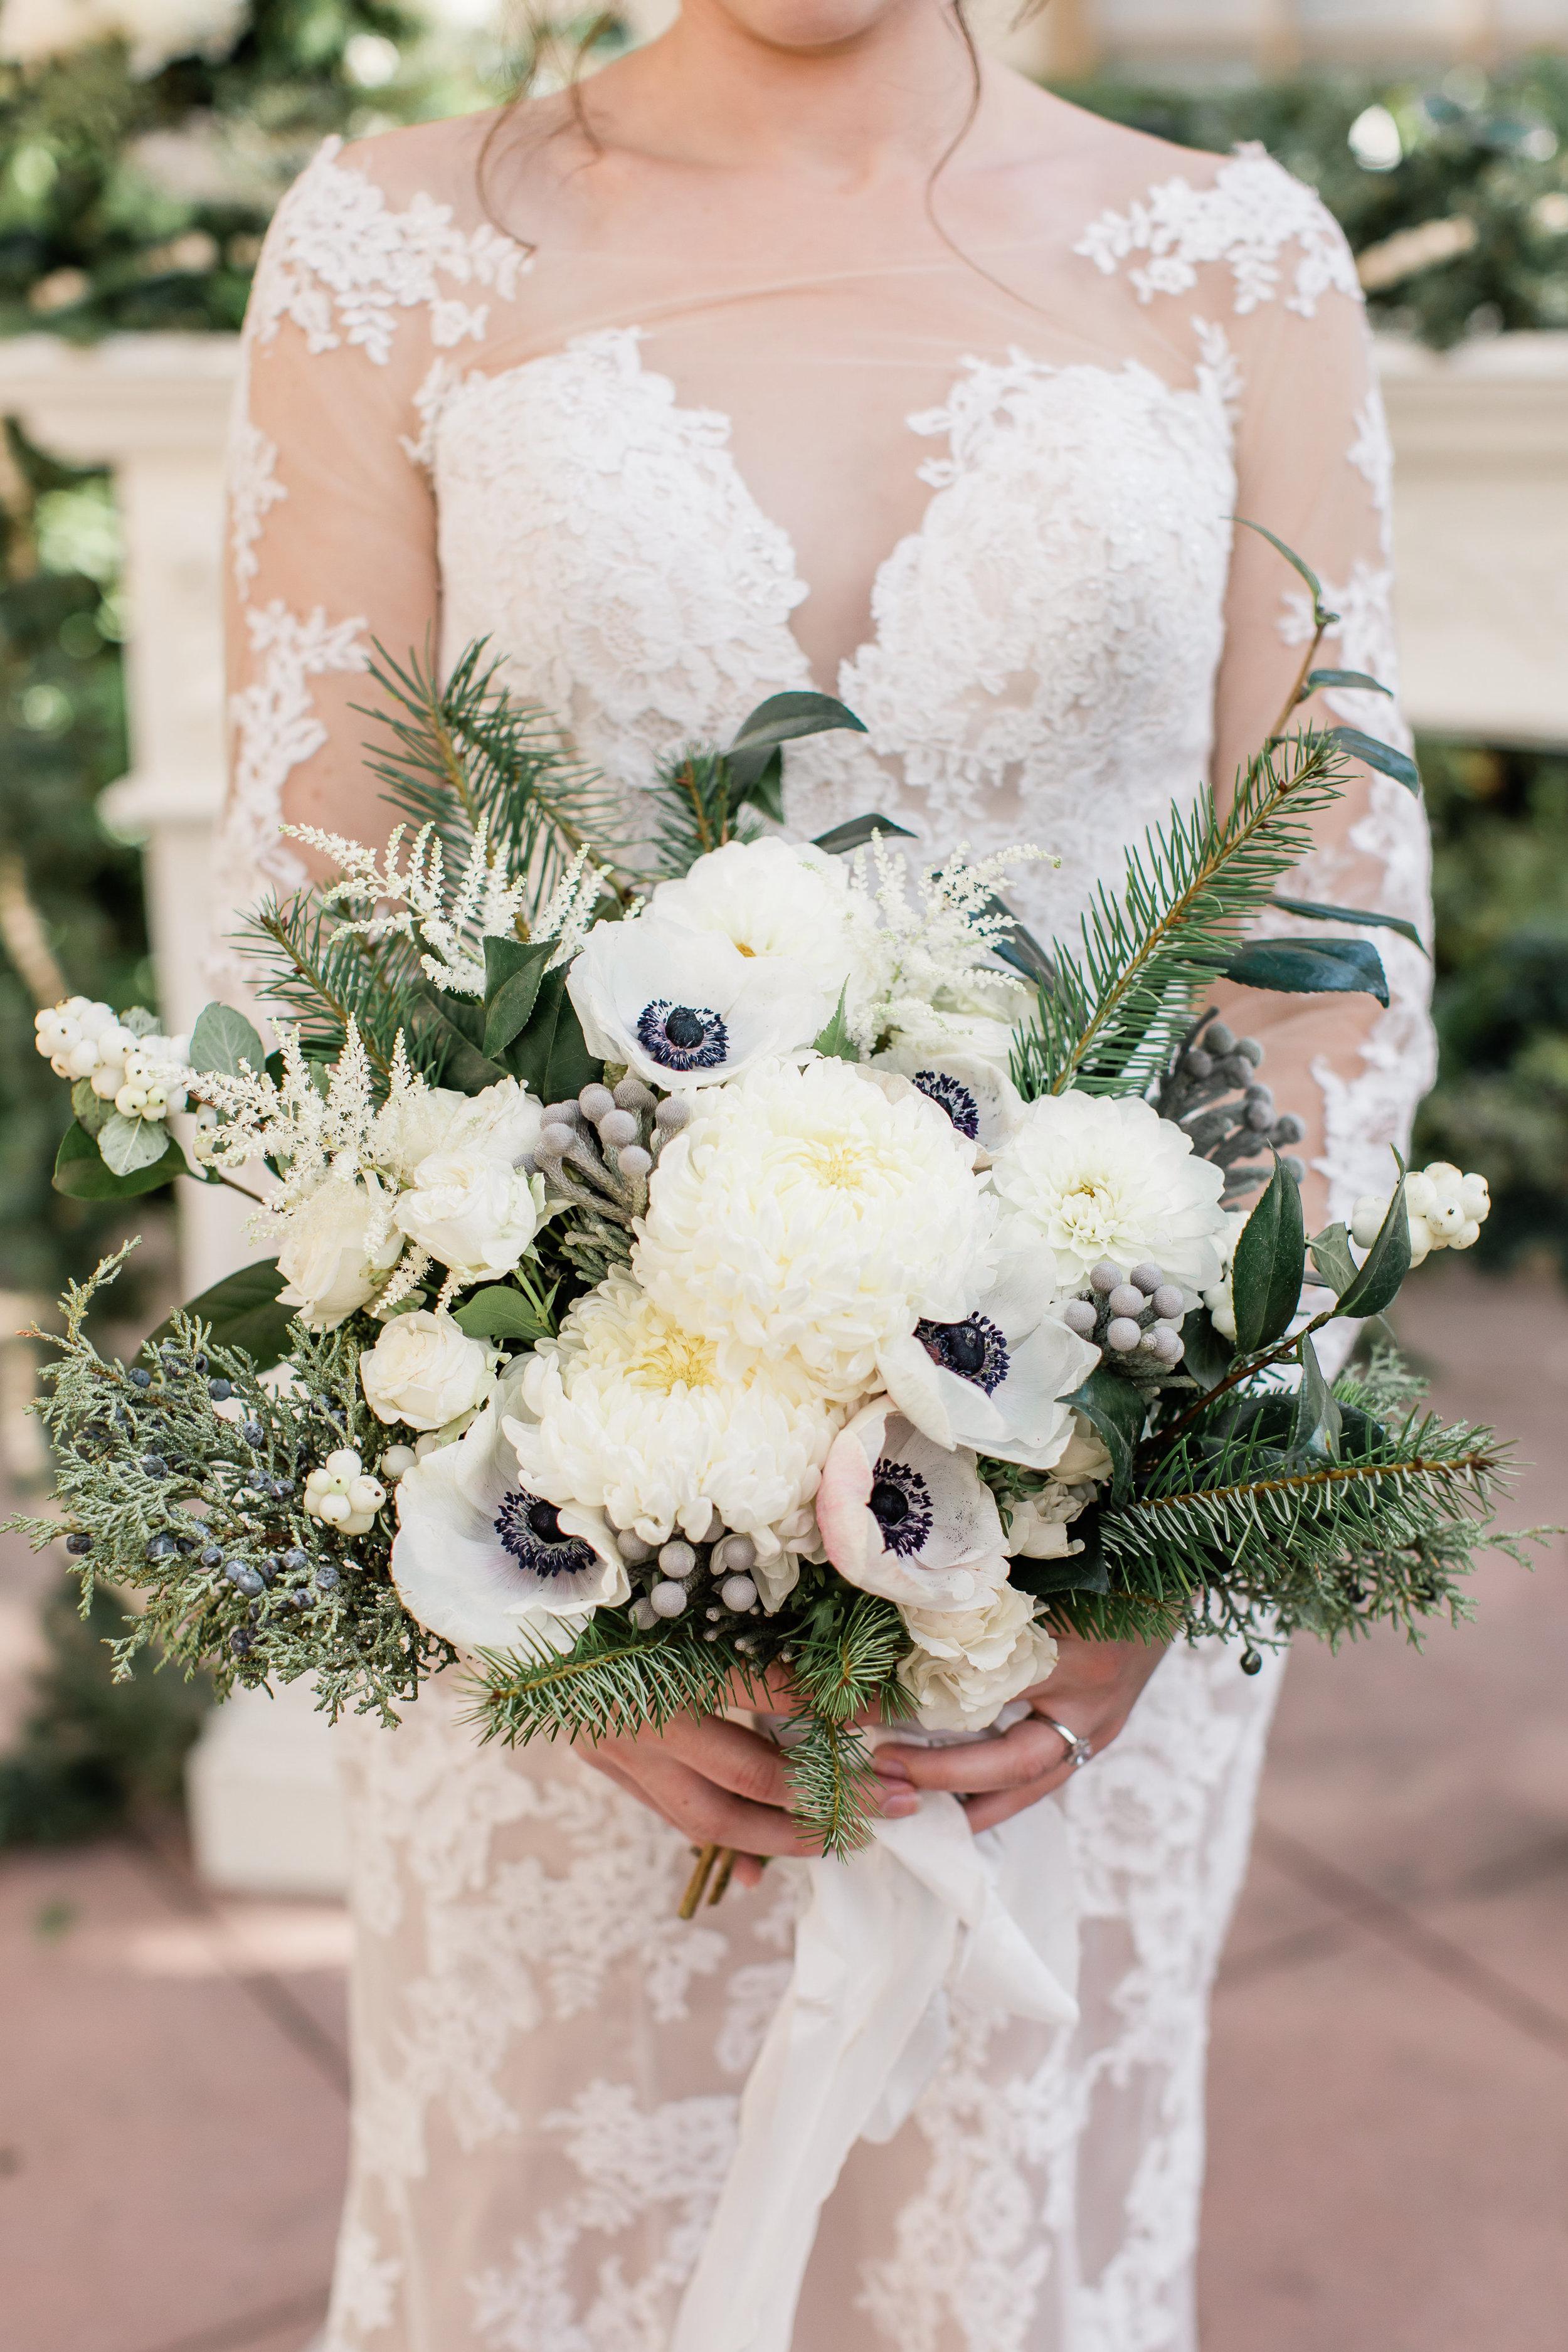 Winter_Wedding_Florals_Bouquet_Des_Moines_Iowa_Sibyl_Sophia.jpg